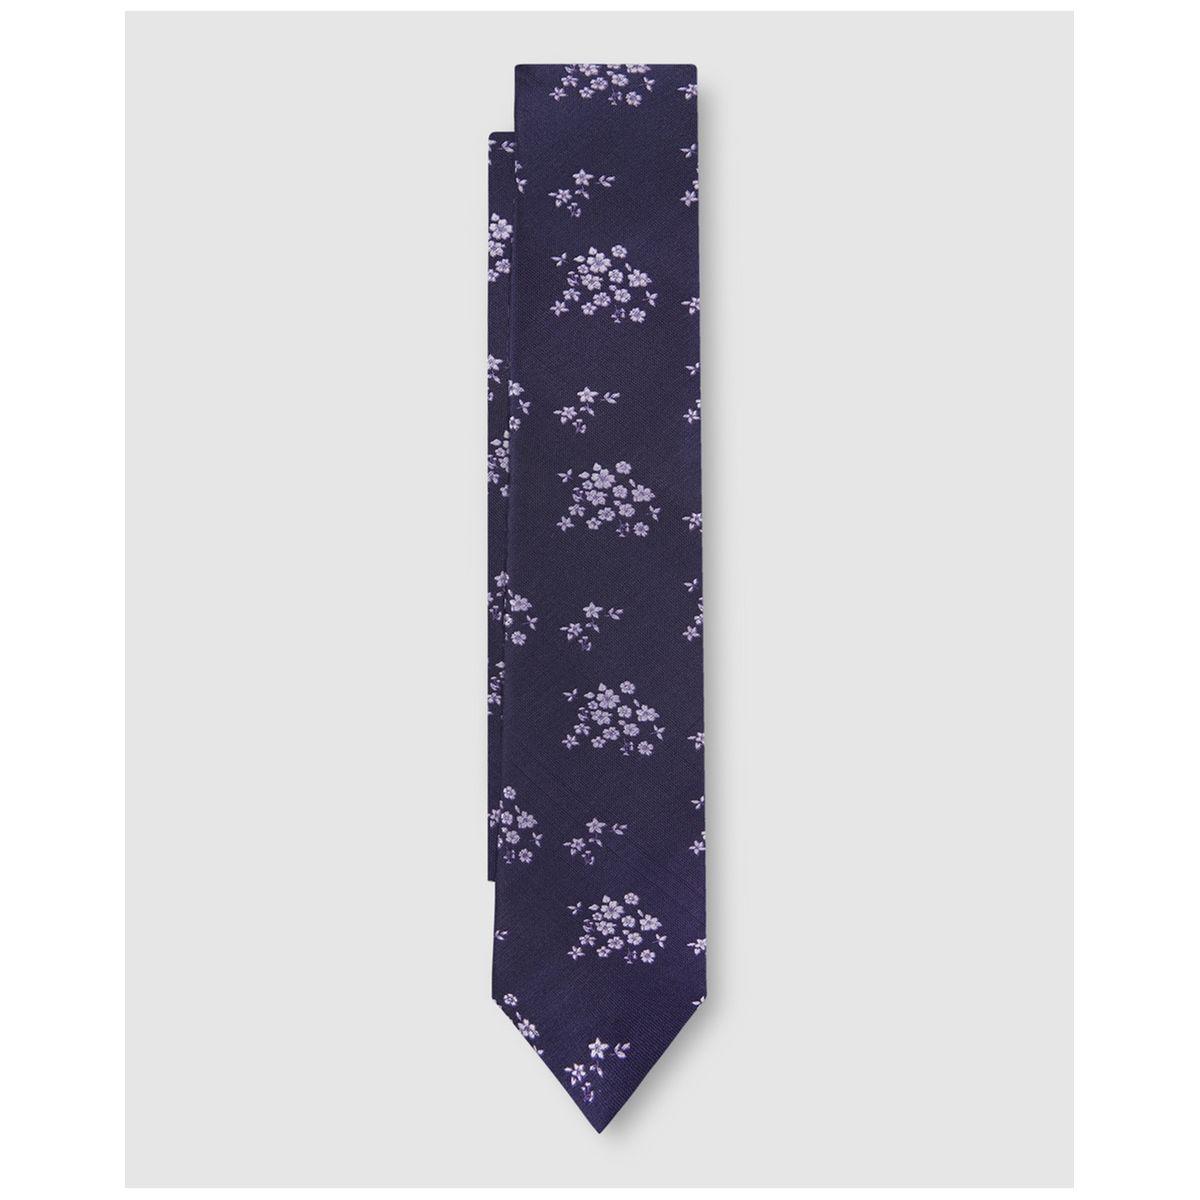 Cravate bleu marine microimprimé fleurs